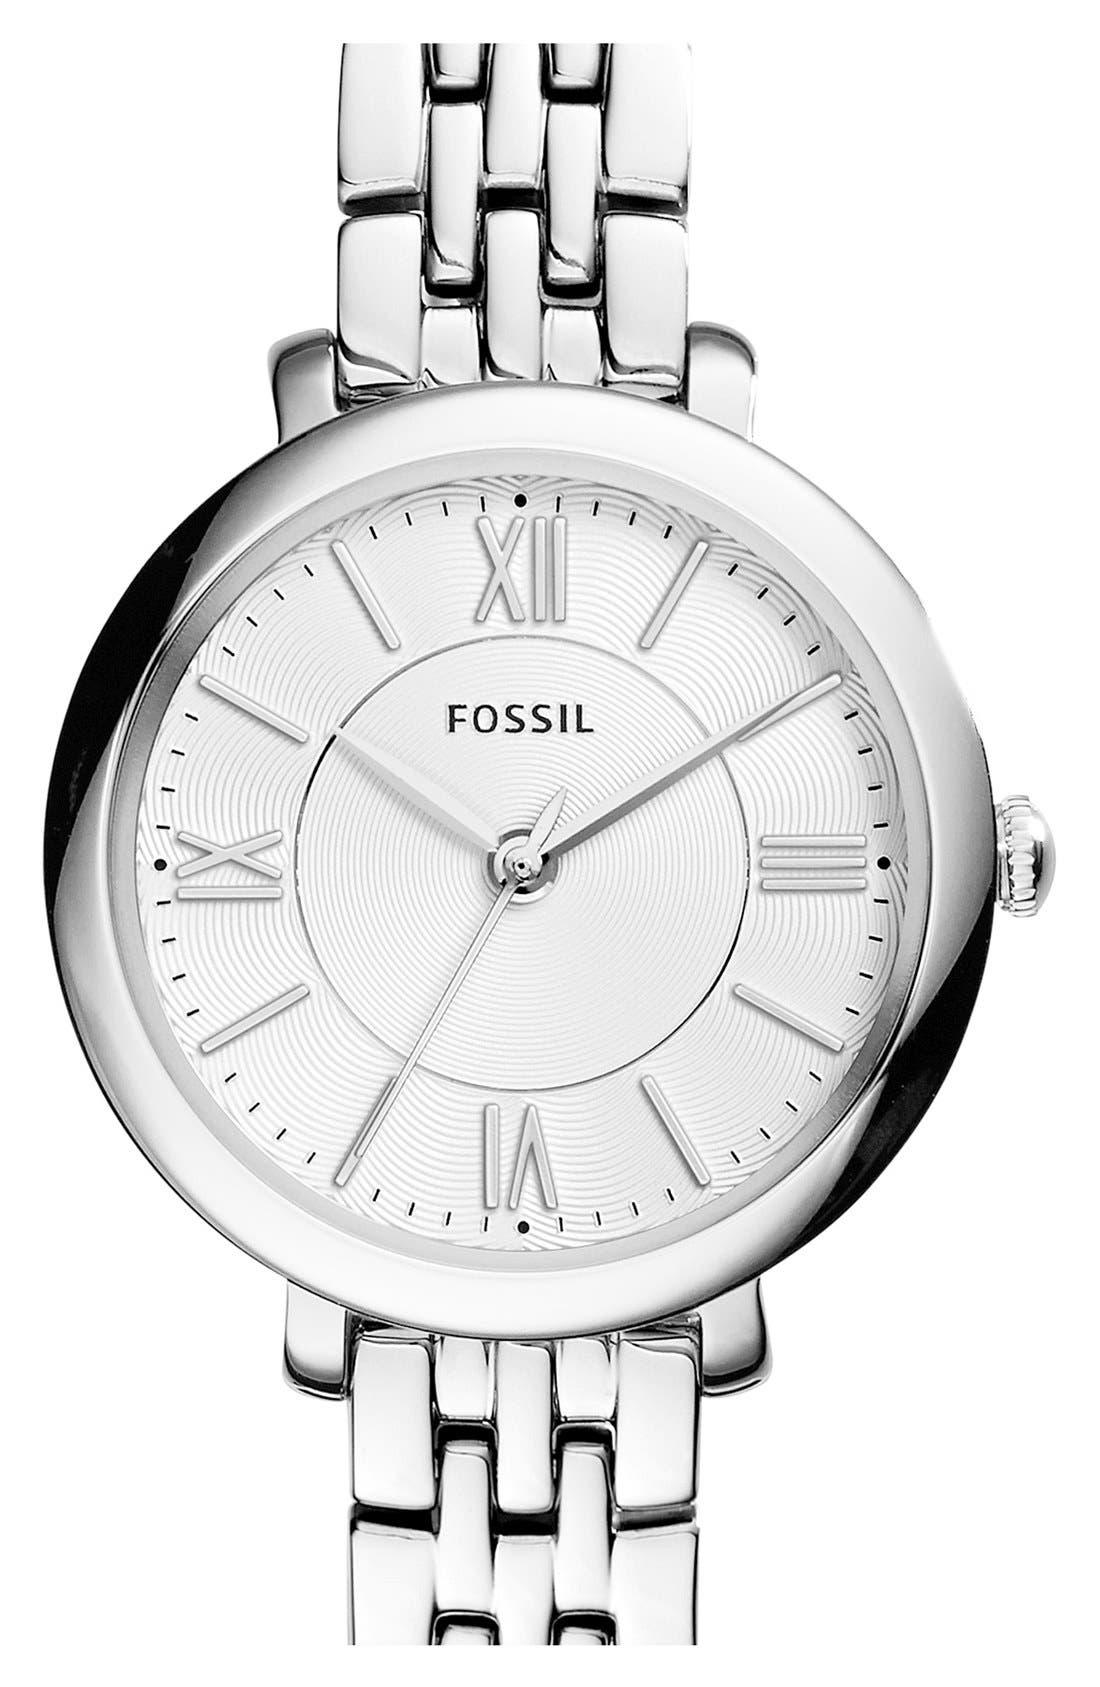 FOSSIL 'Jacqueline' Round Bracelet Watch, 26mm, Main, color, SILVER